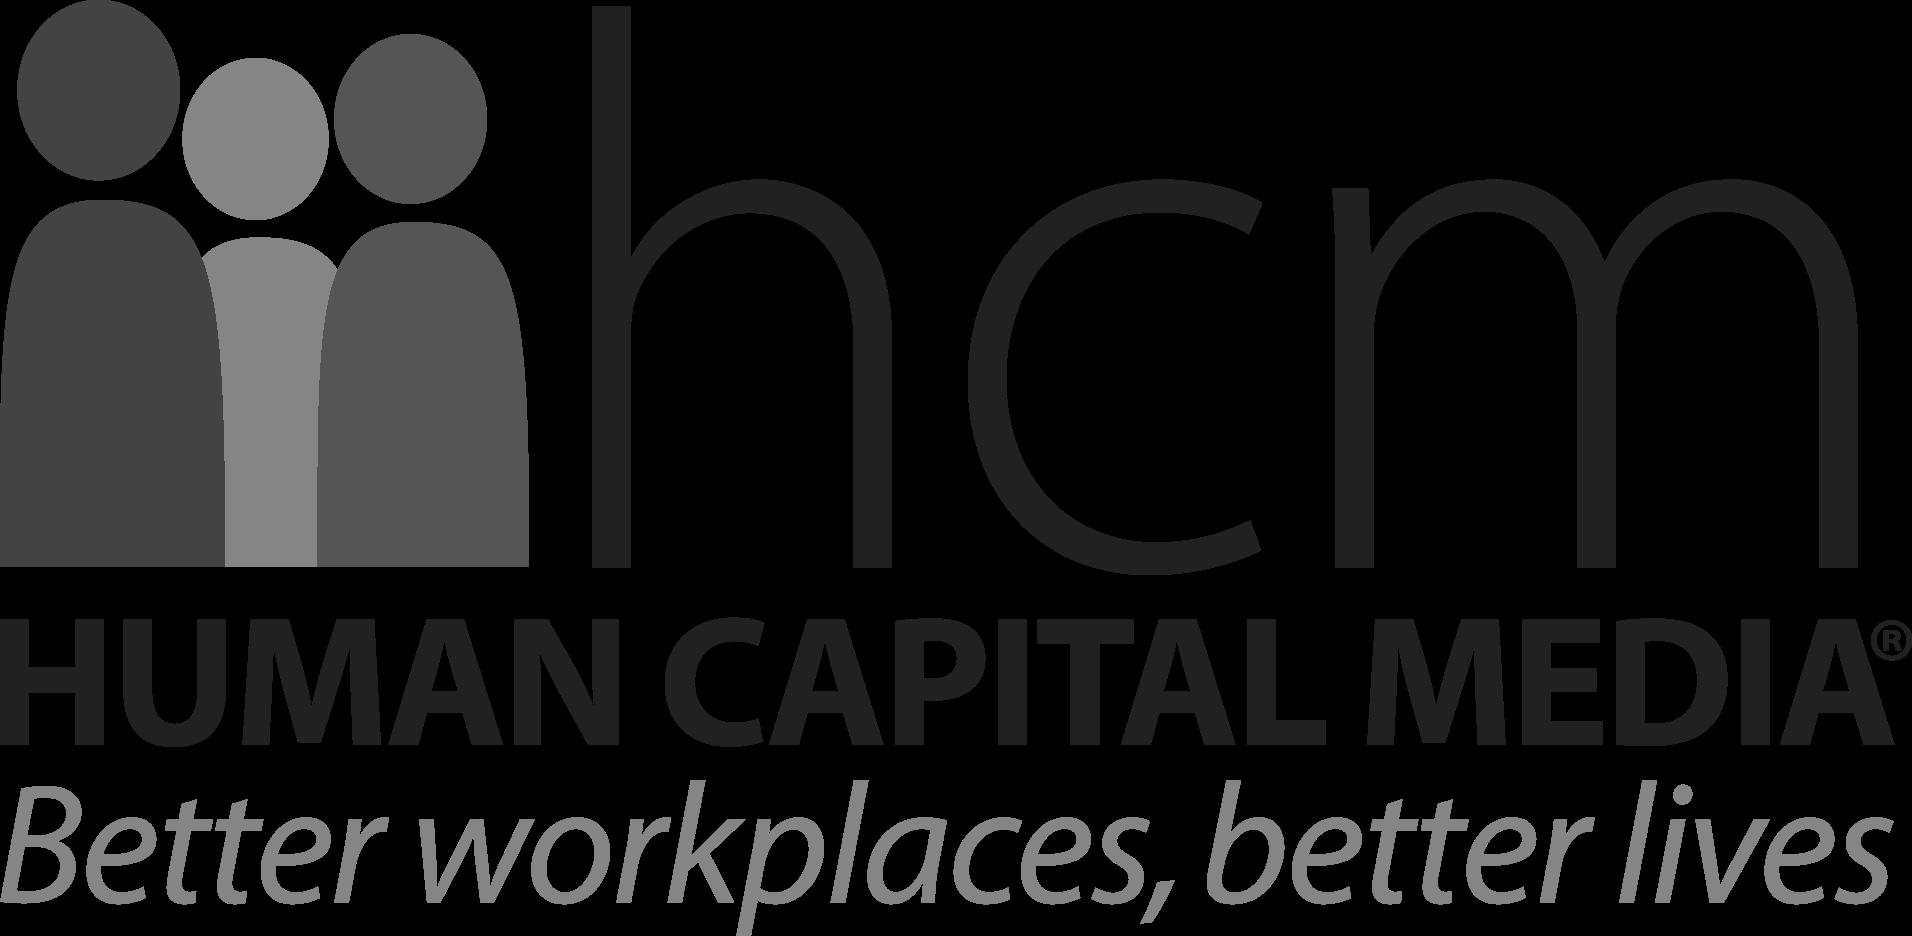 Human Capital Media